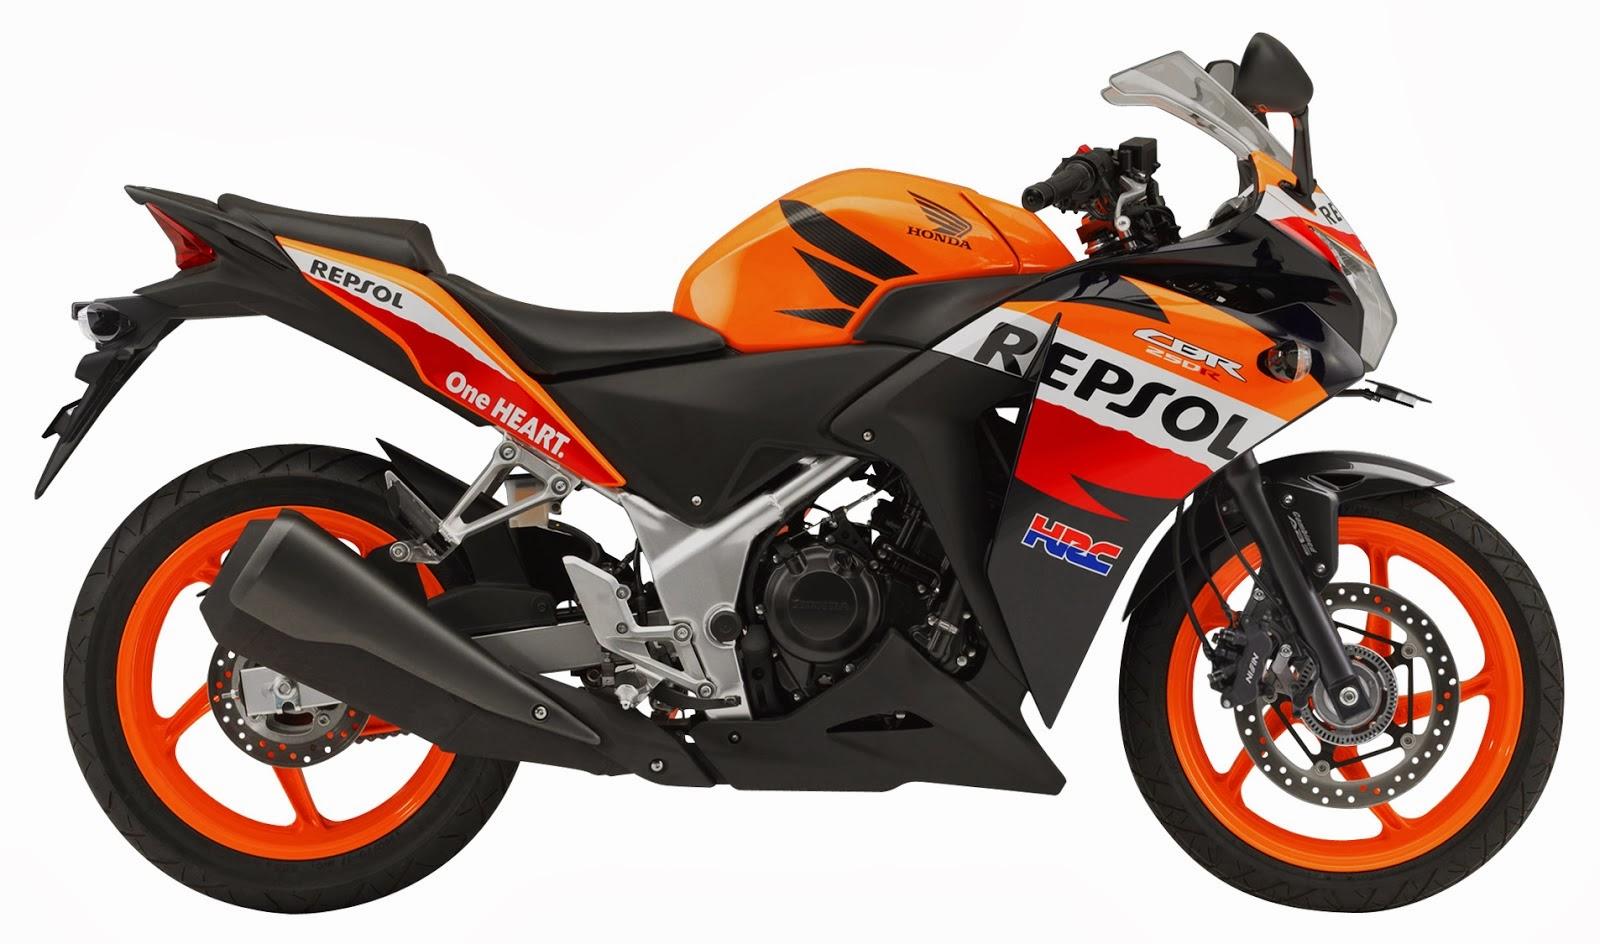 Koleksi Gambar Motor Honda CBR Repsol Edition